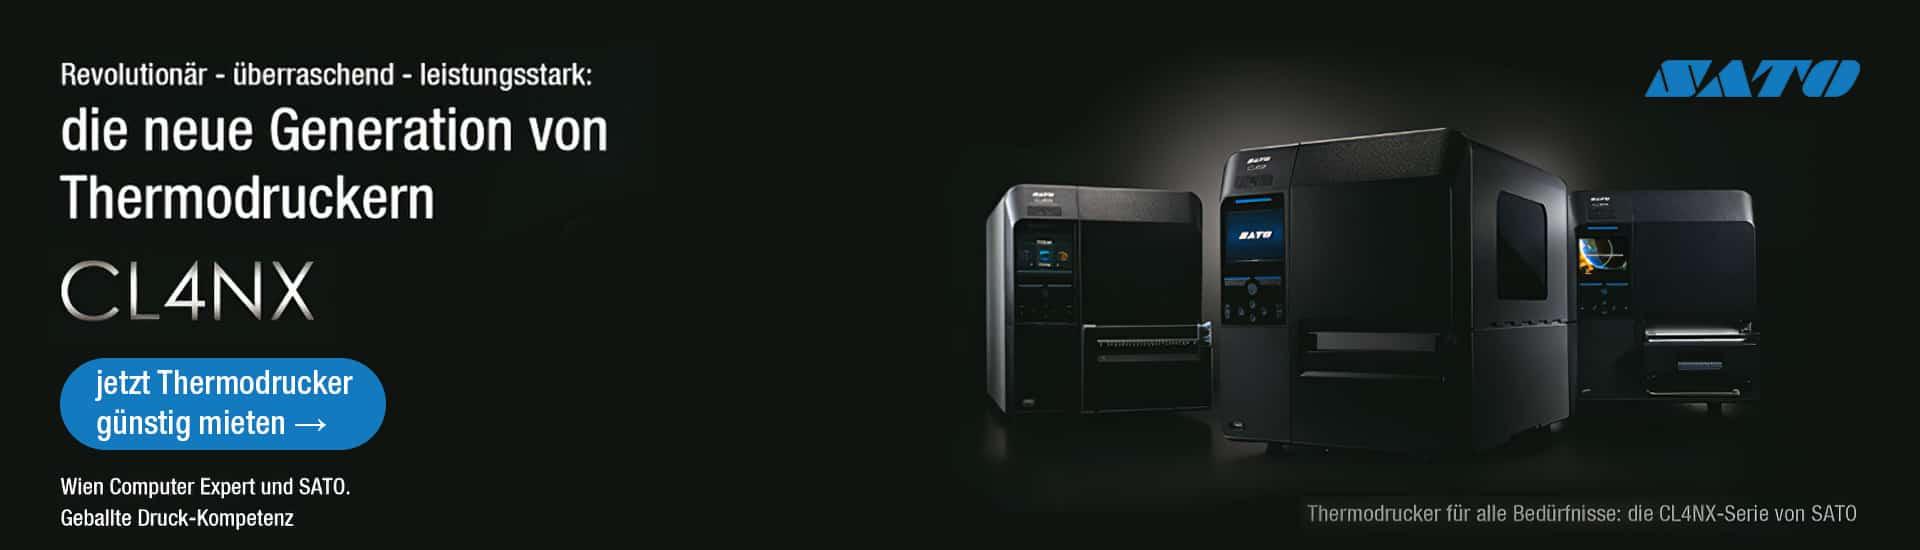 SATO CL4NX - Thermodrucker günstig mieten